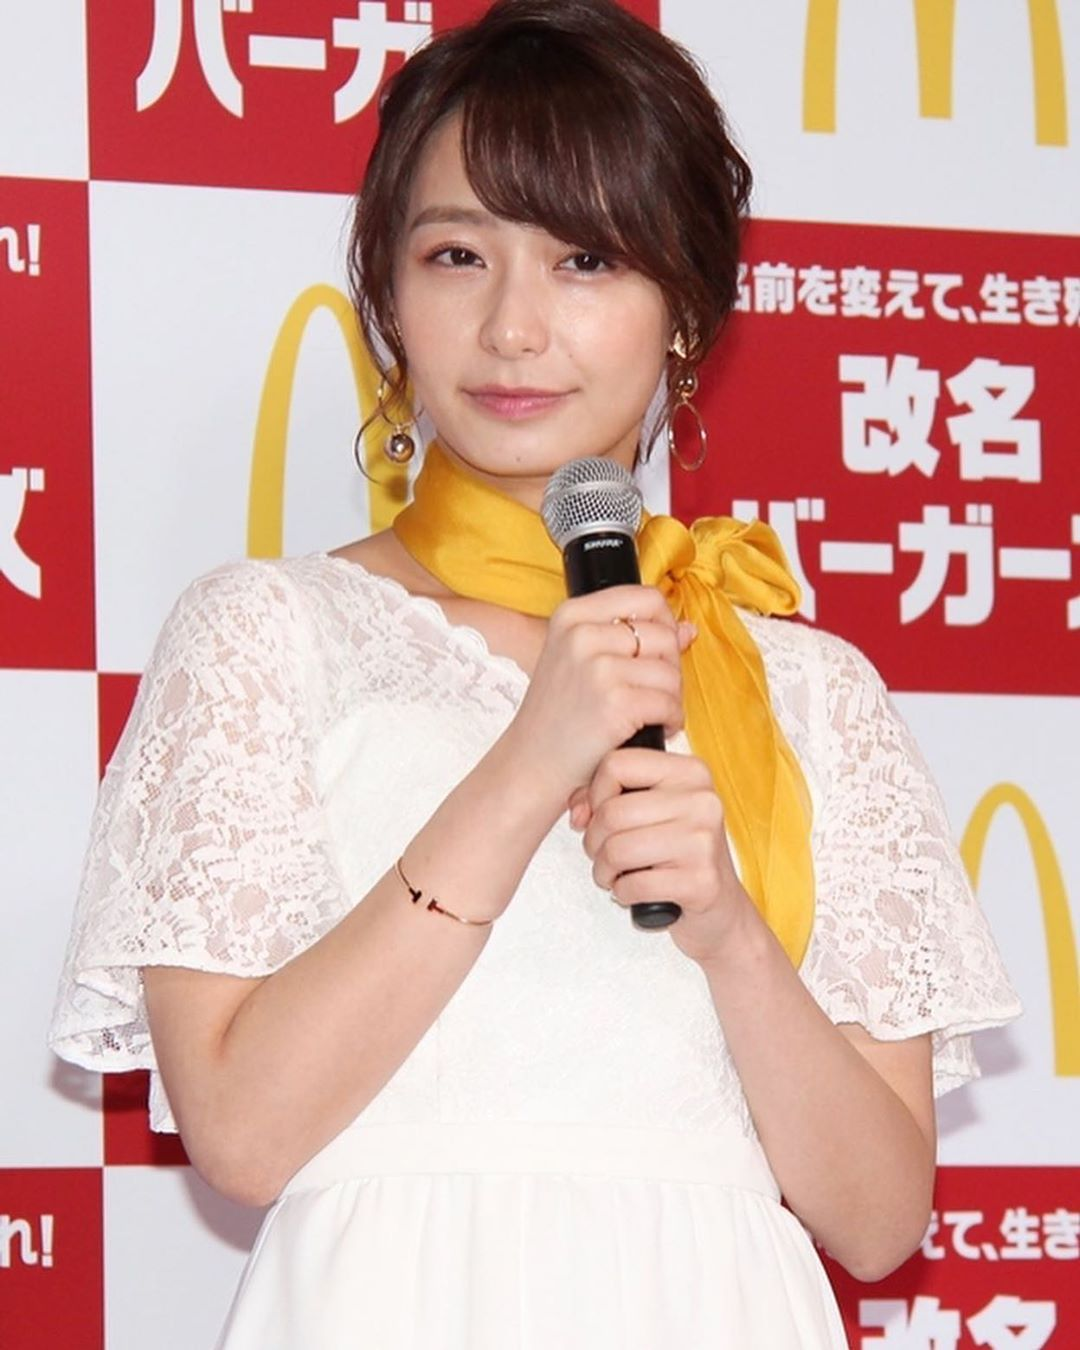 ugaki_misato294.jpg